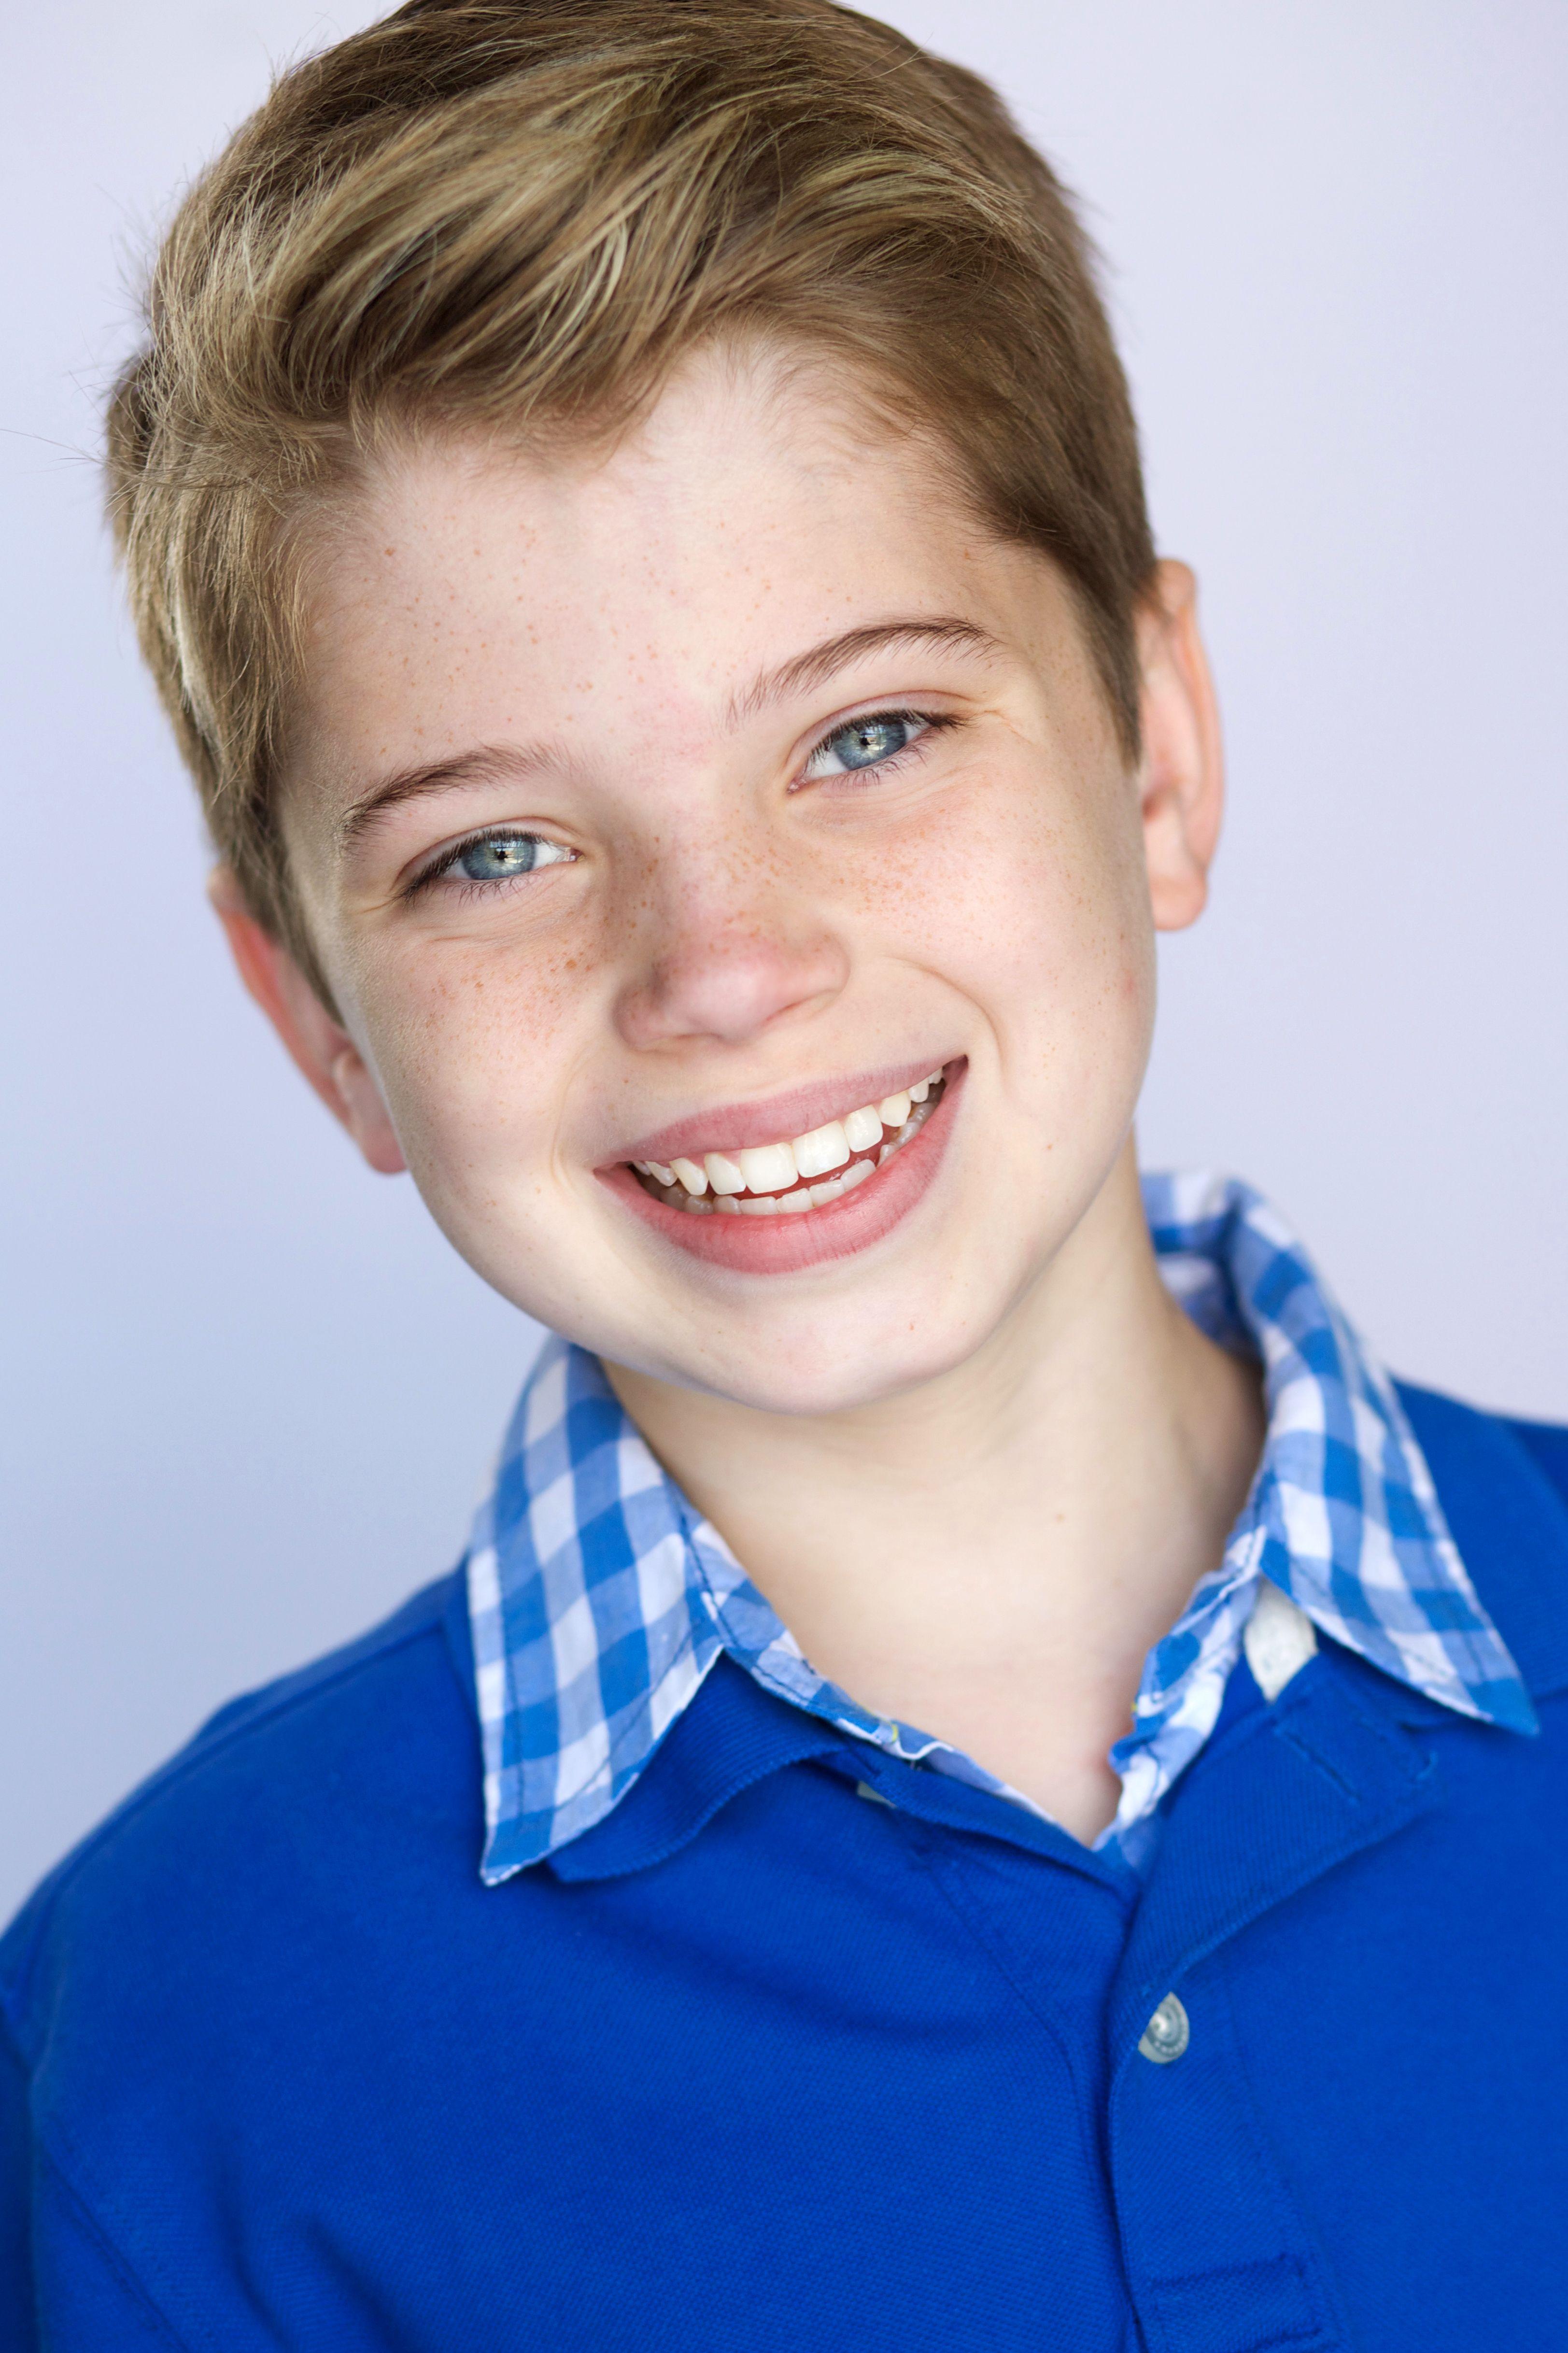 Child Actor Headshot | Model headshots, Boy models ...